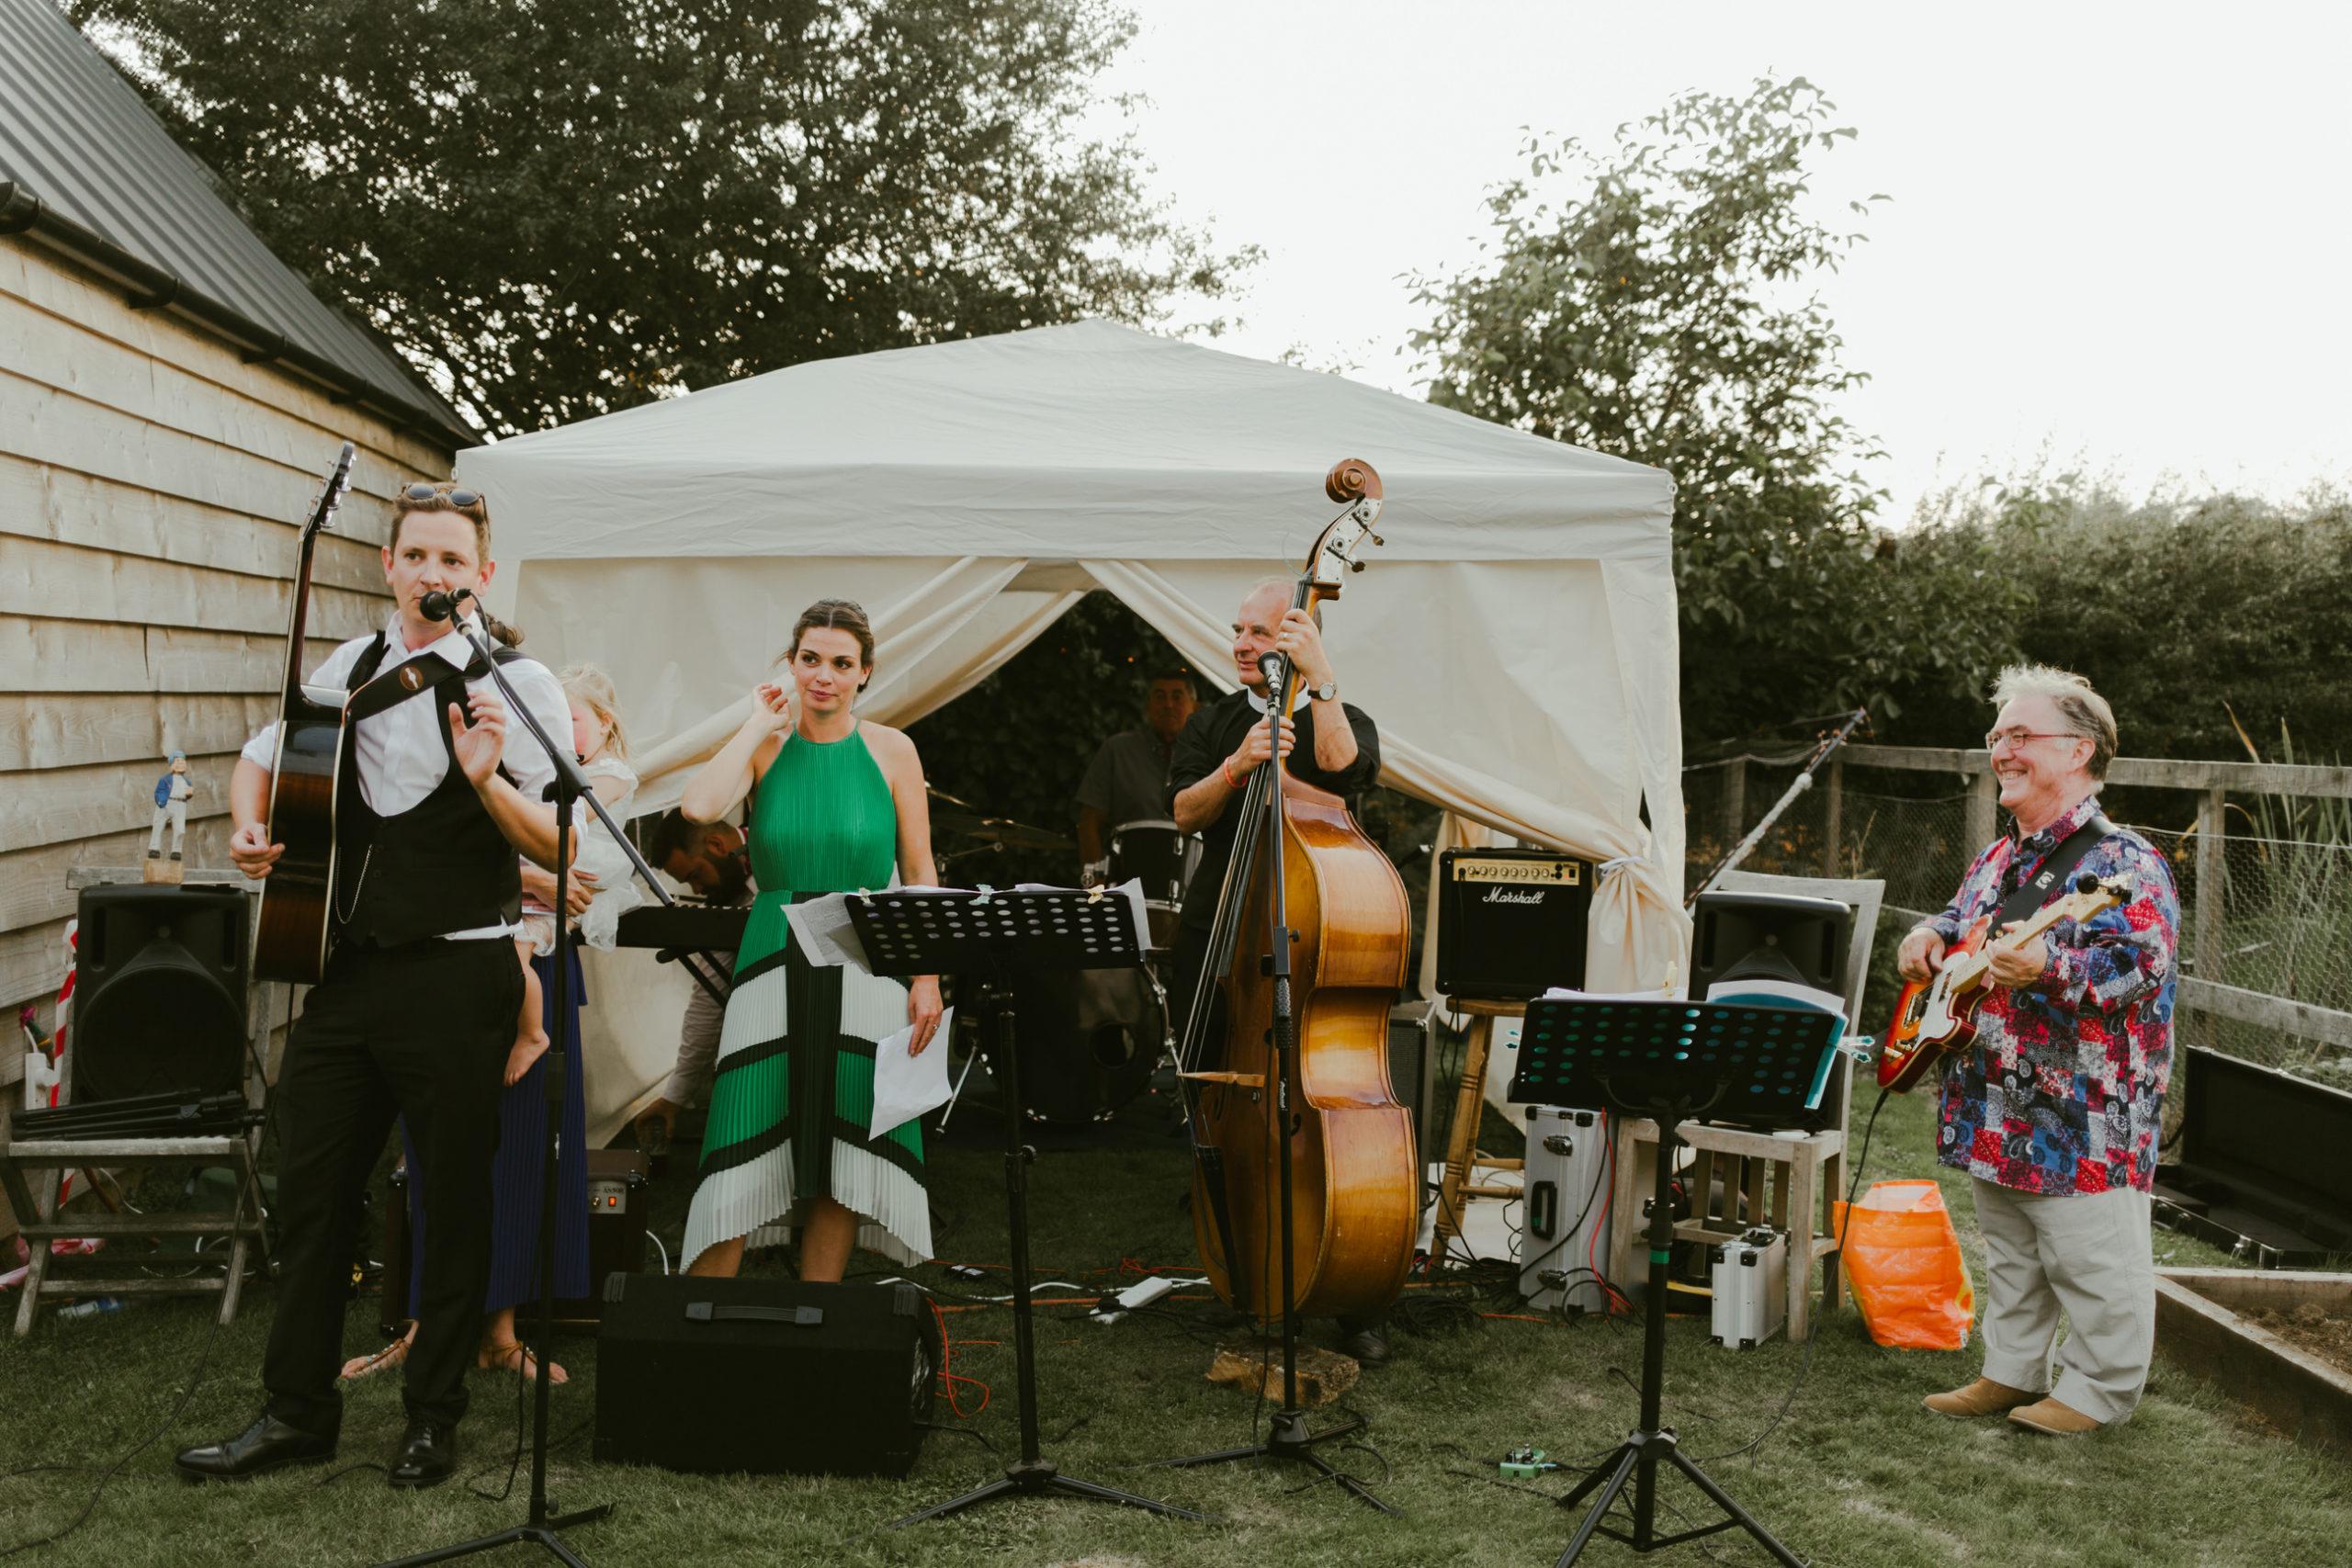 wedding garden party fun dance floor live band